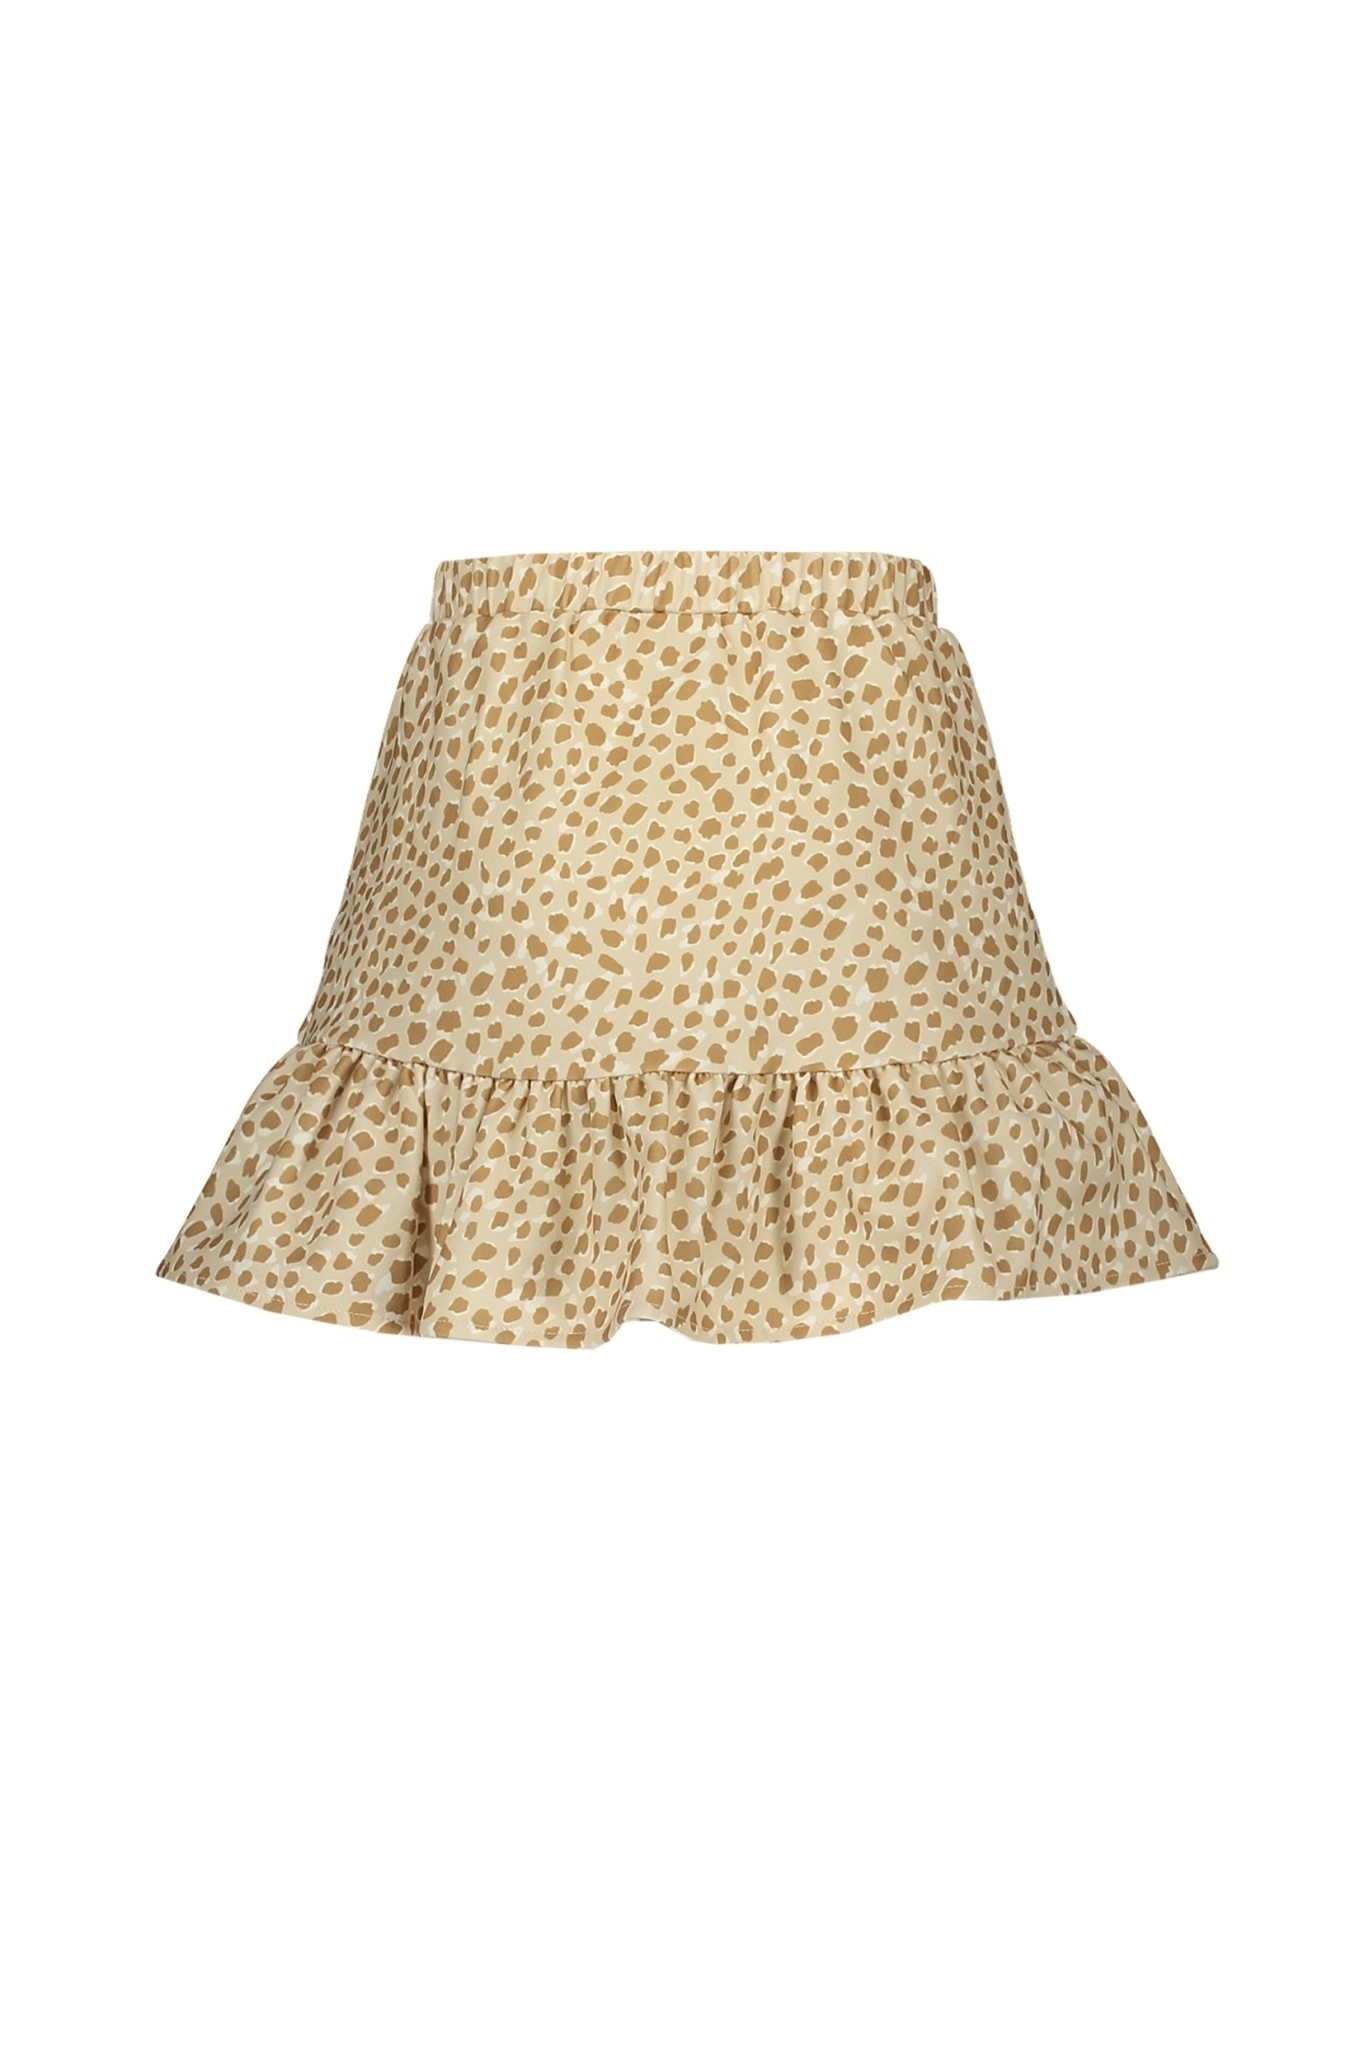 "Diana Skirt ""Animal Dots"""